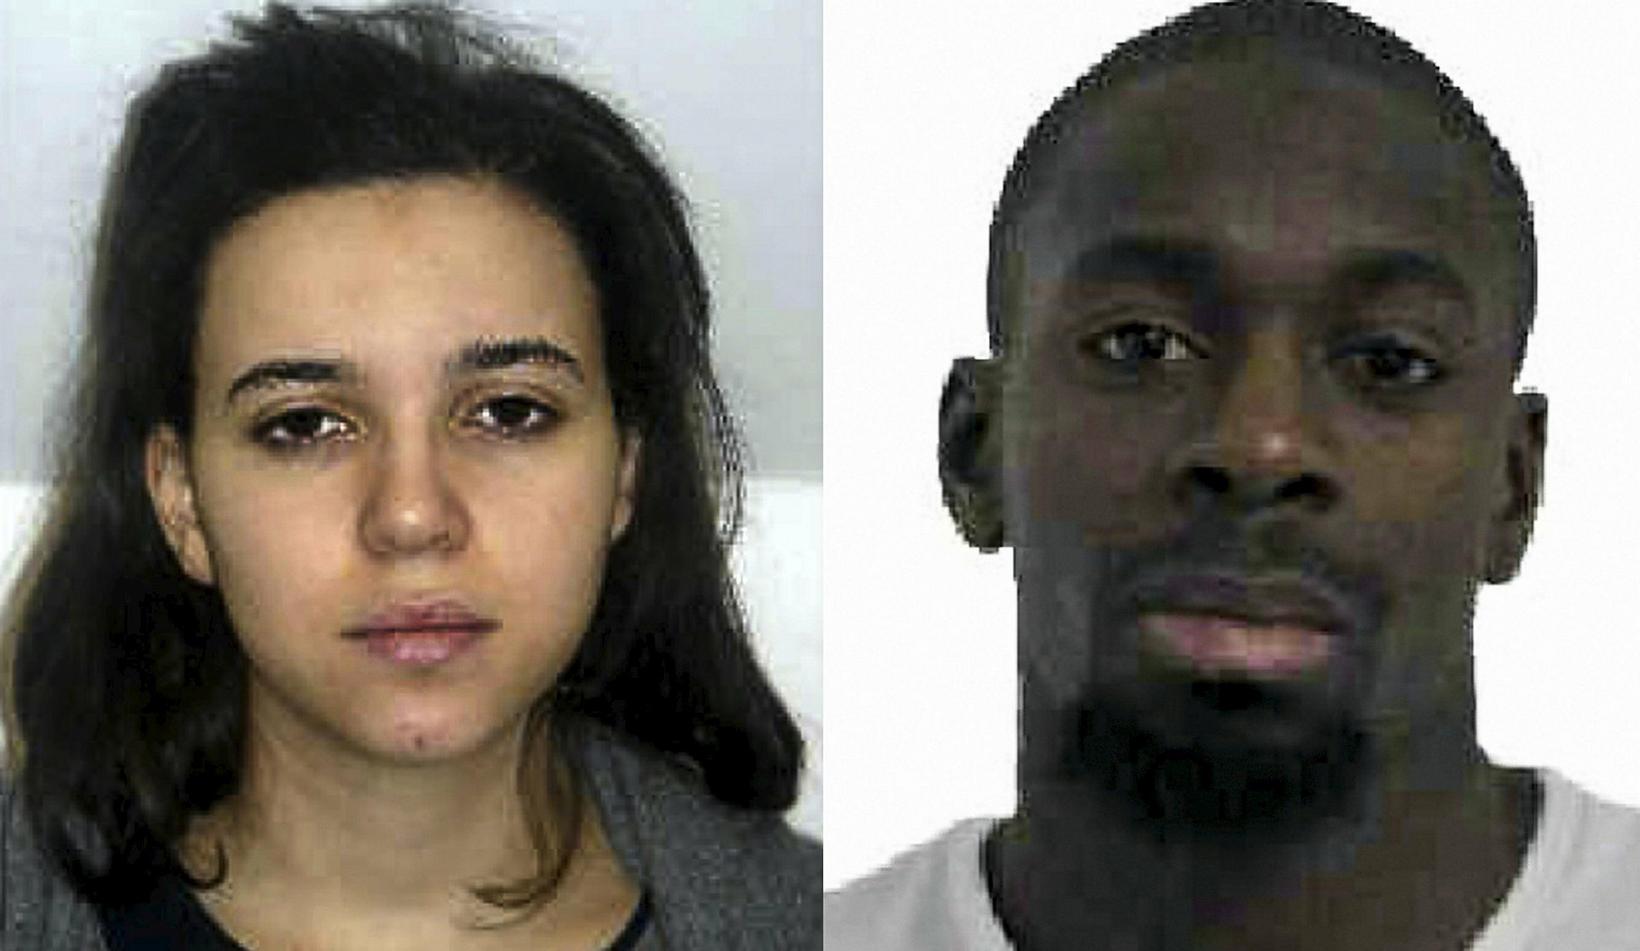 Hayat Boumeddiene og Amedy Coulibaly.